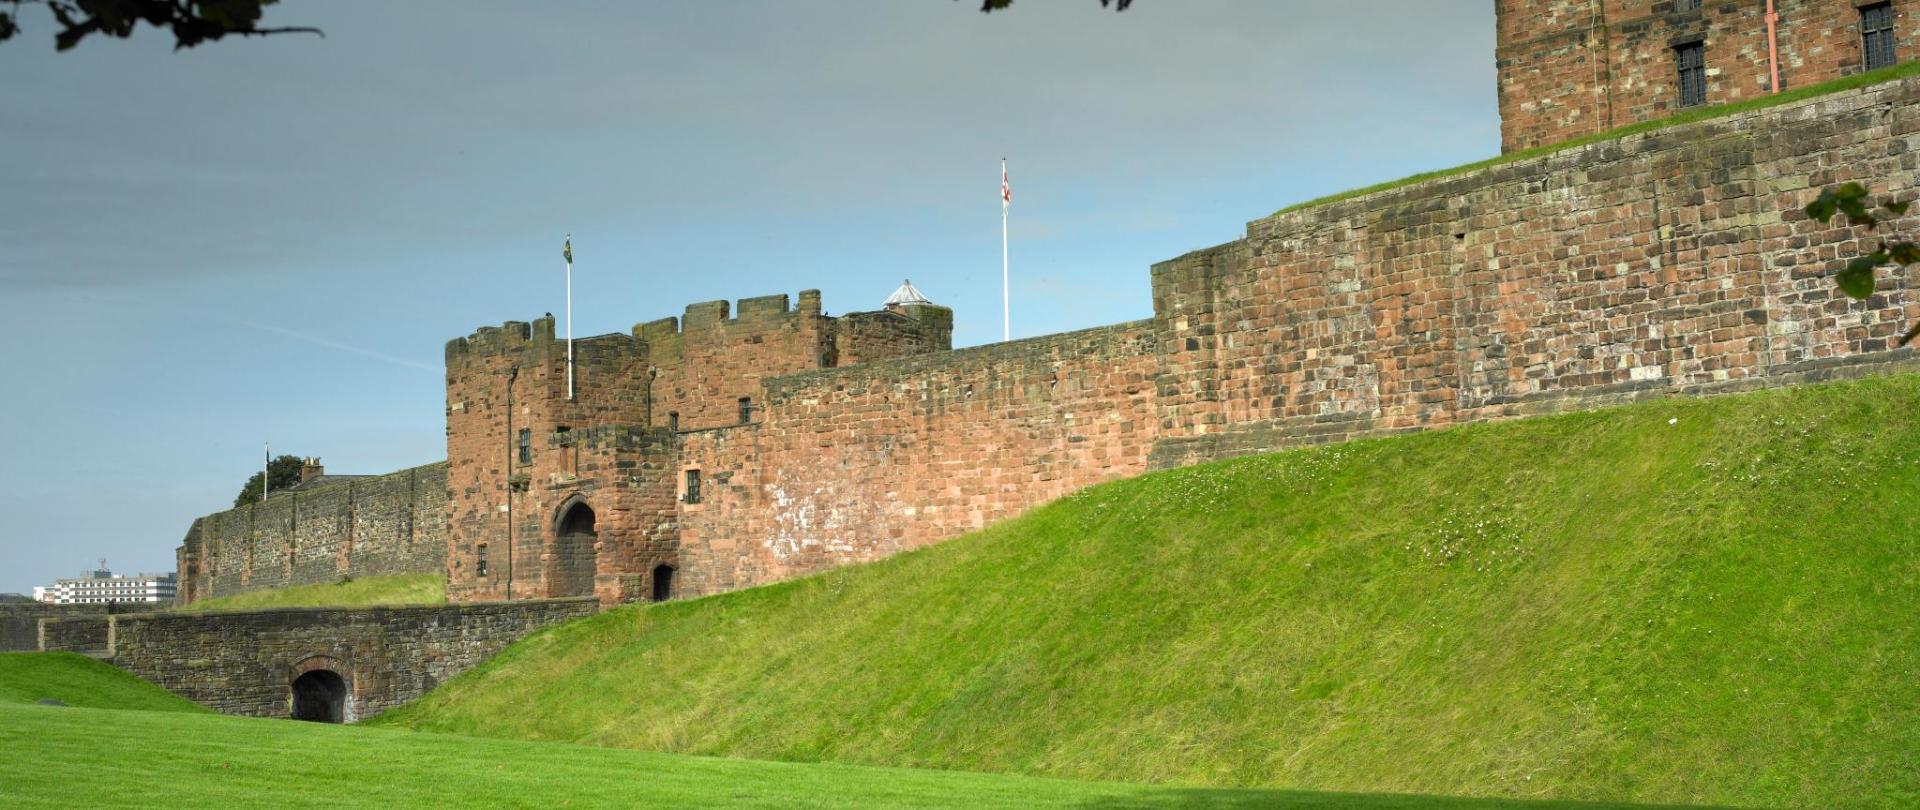 carlisle castle.jpg